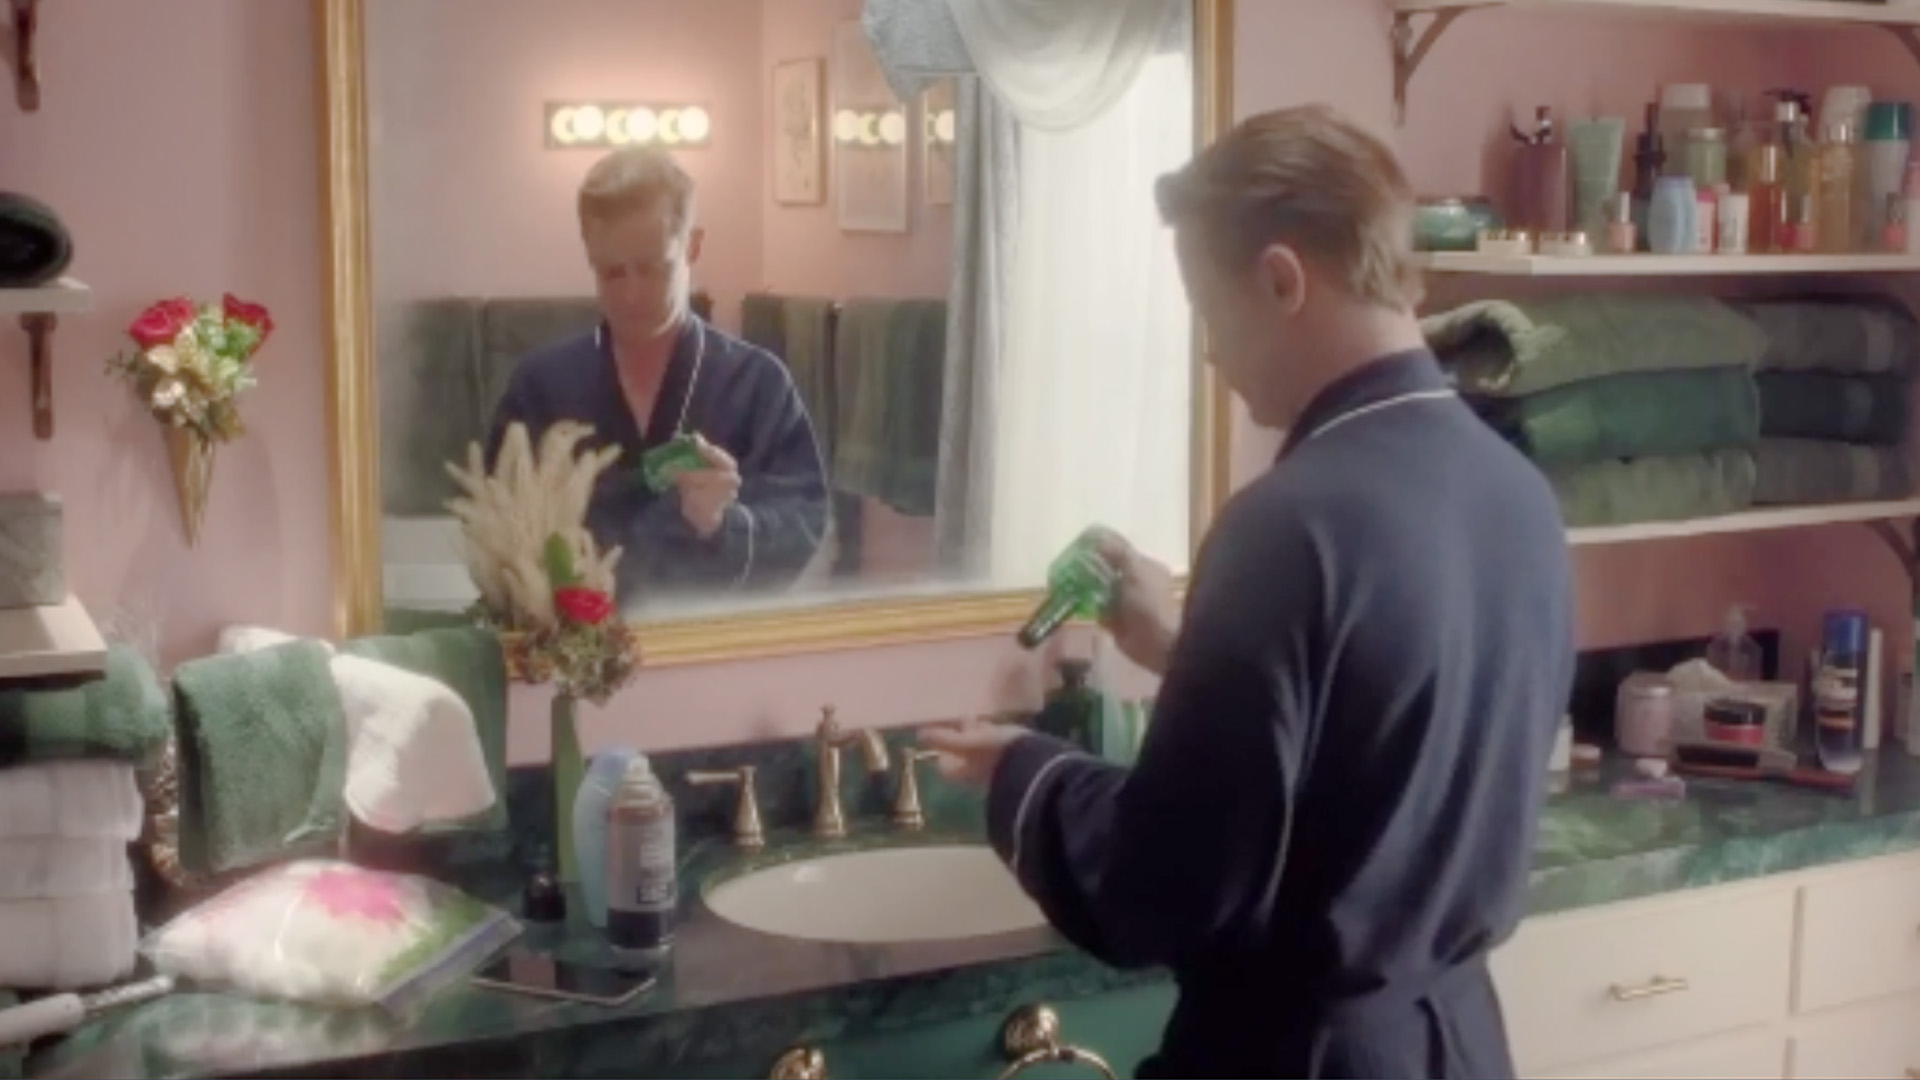 KELO Macaulay Culkin Google Assistant ad